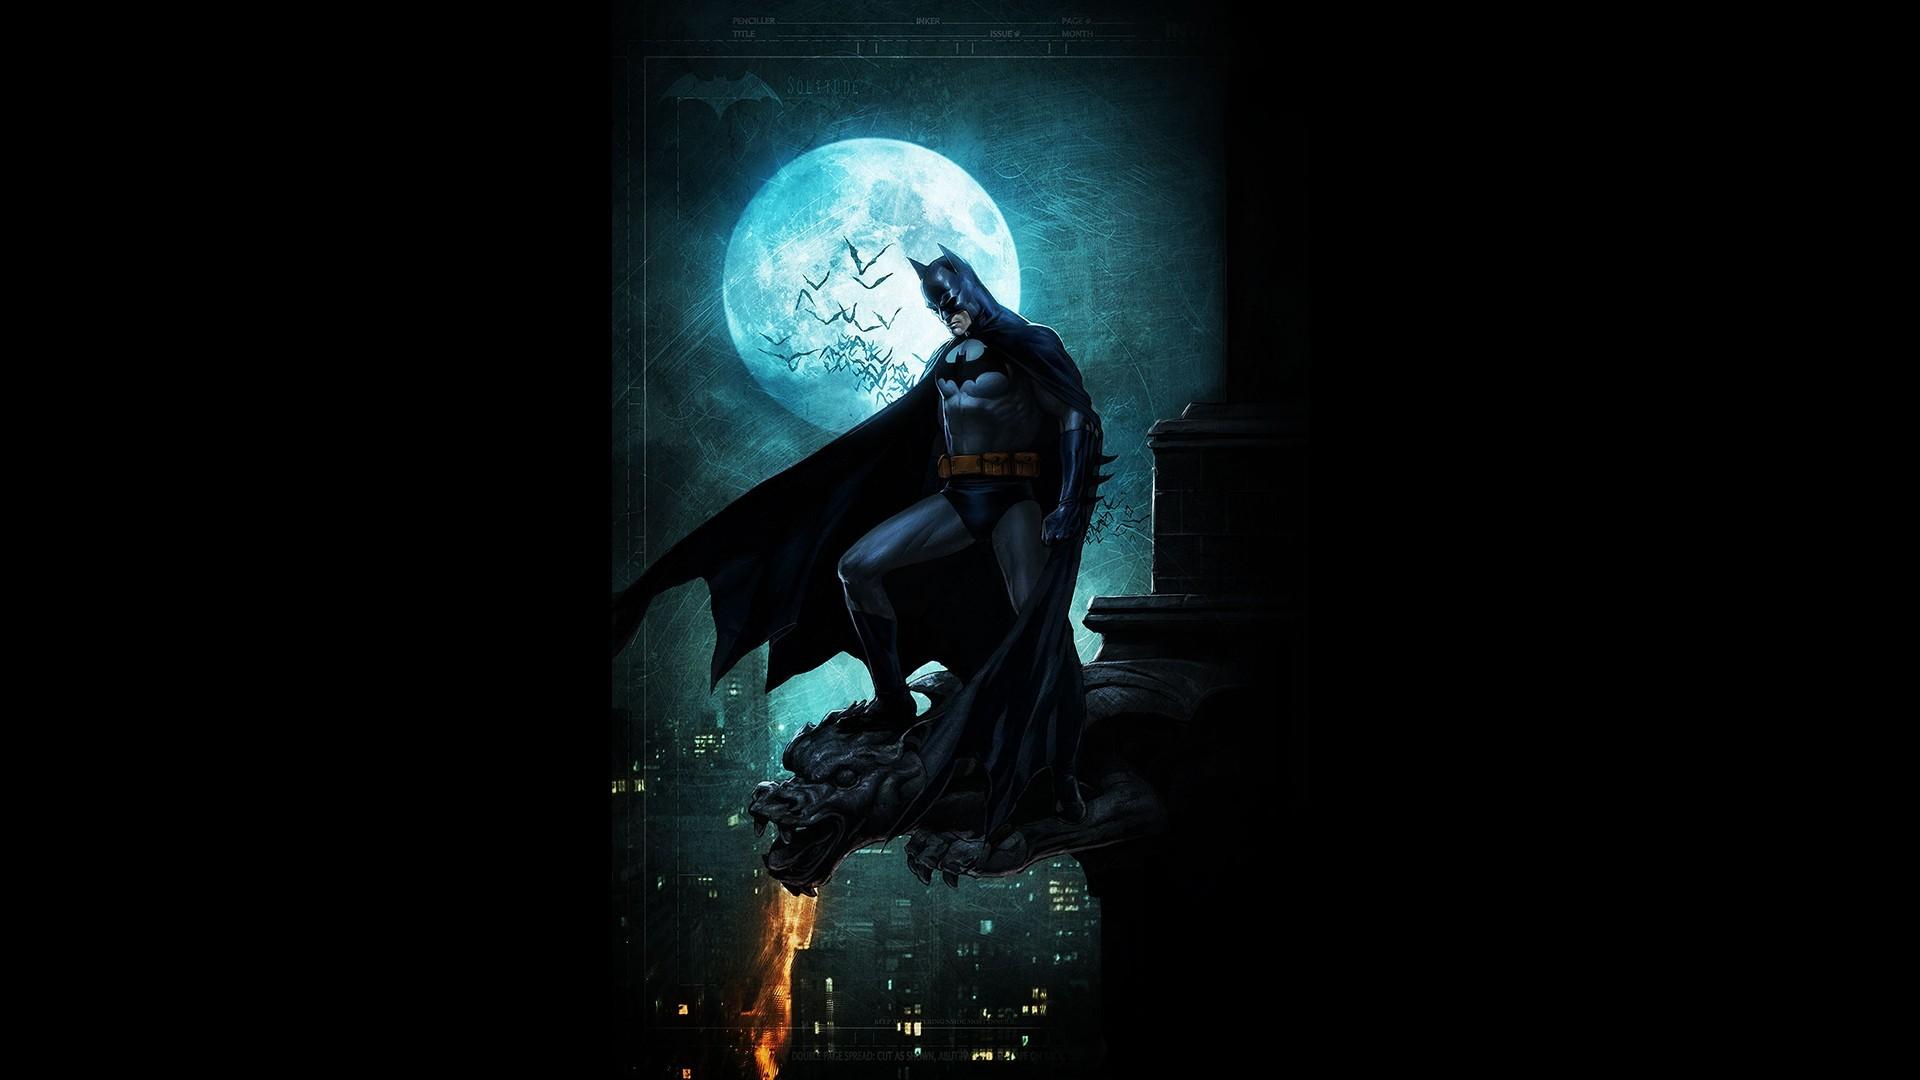 Gotham City · fan art · black background